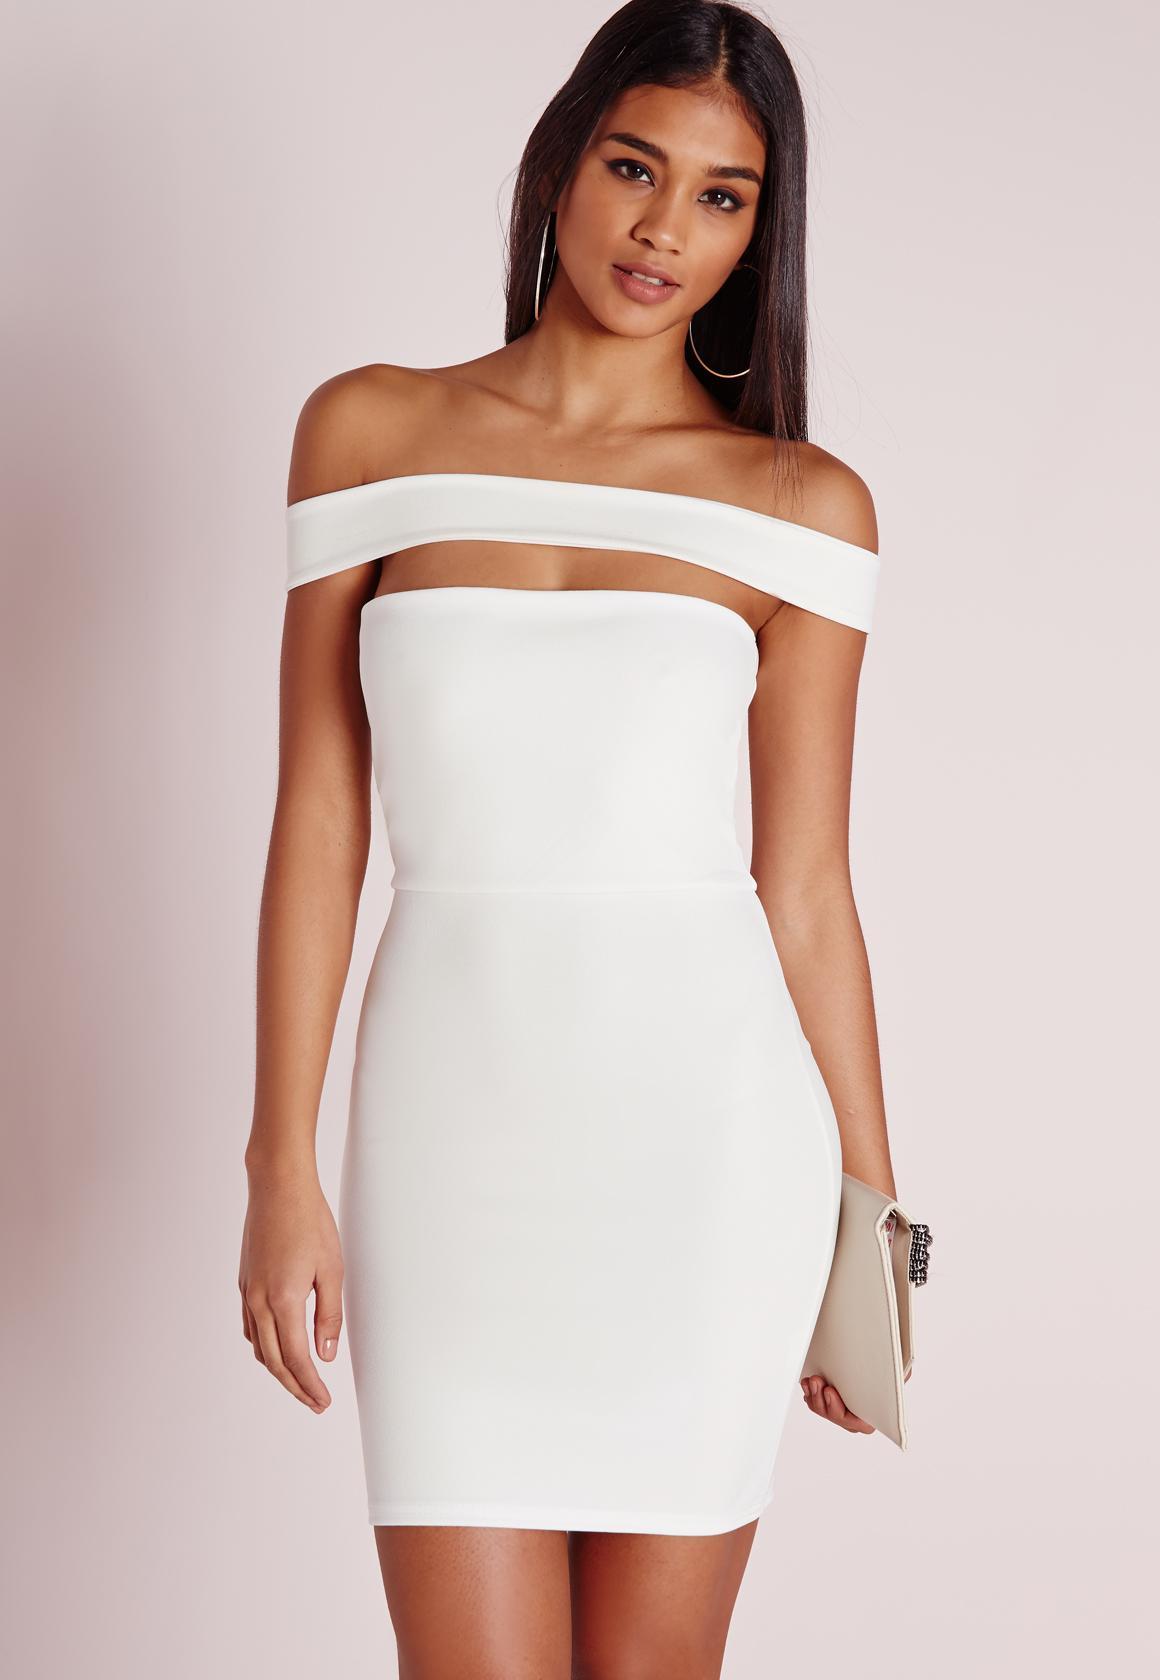 Robe de soiree blanche moulante